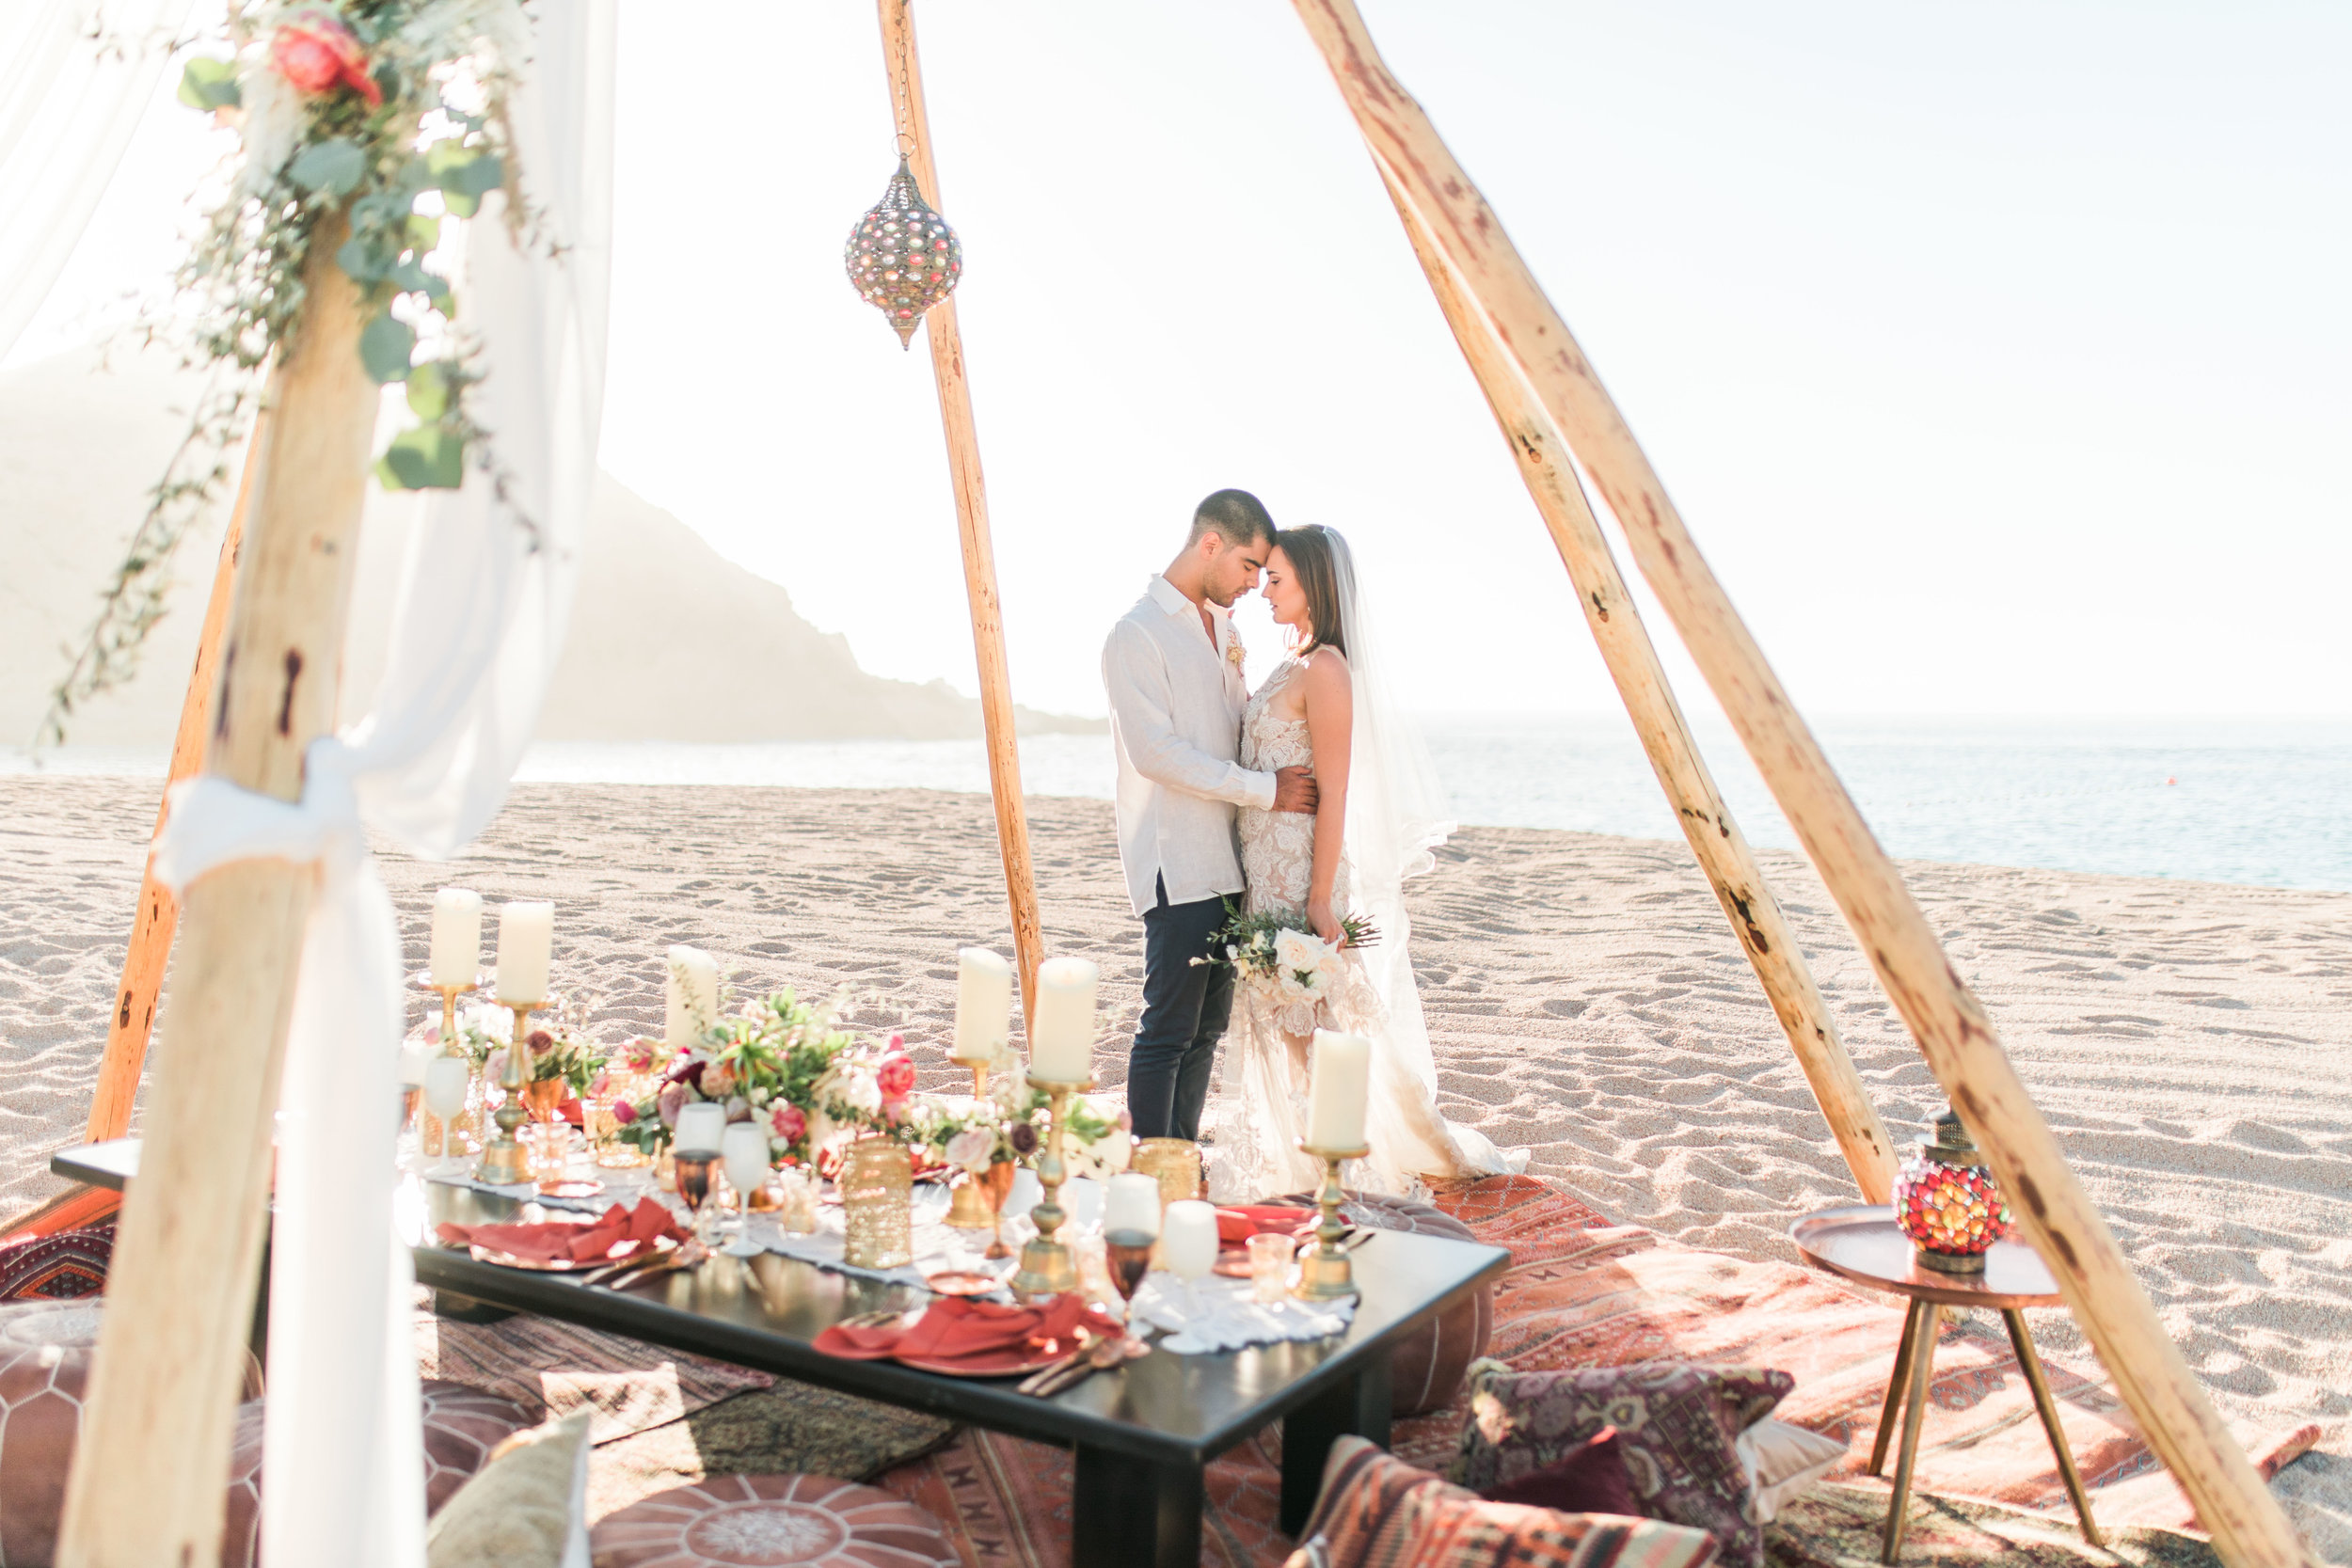 Montage-Cabo-Wedding-Photos-JBJ-Pictures-31.jpg